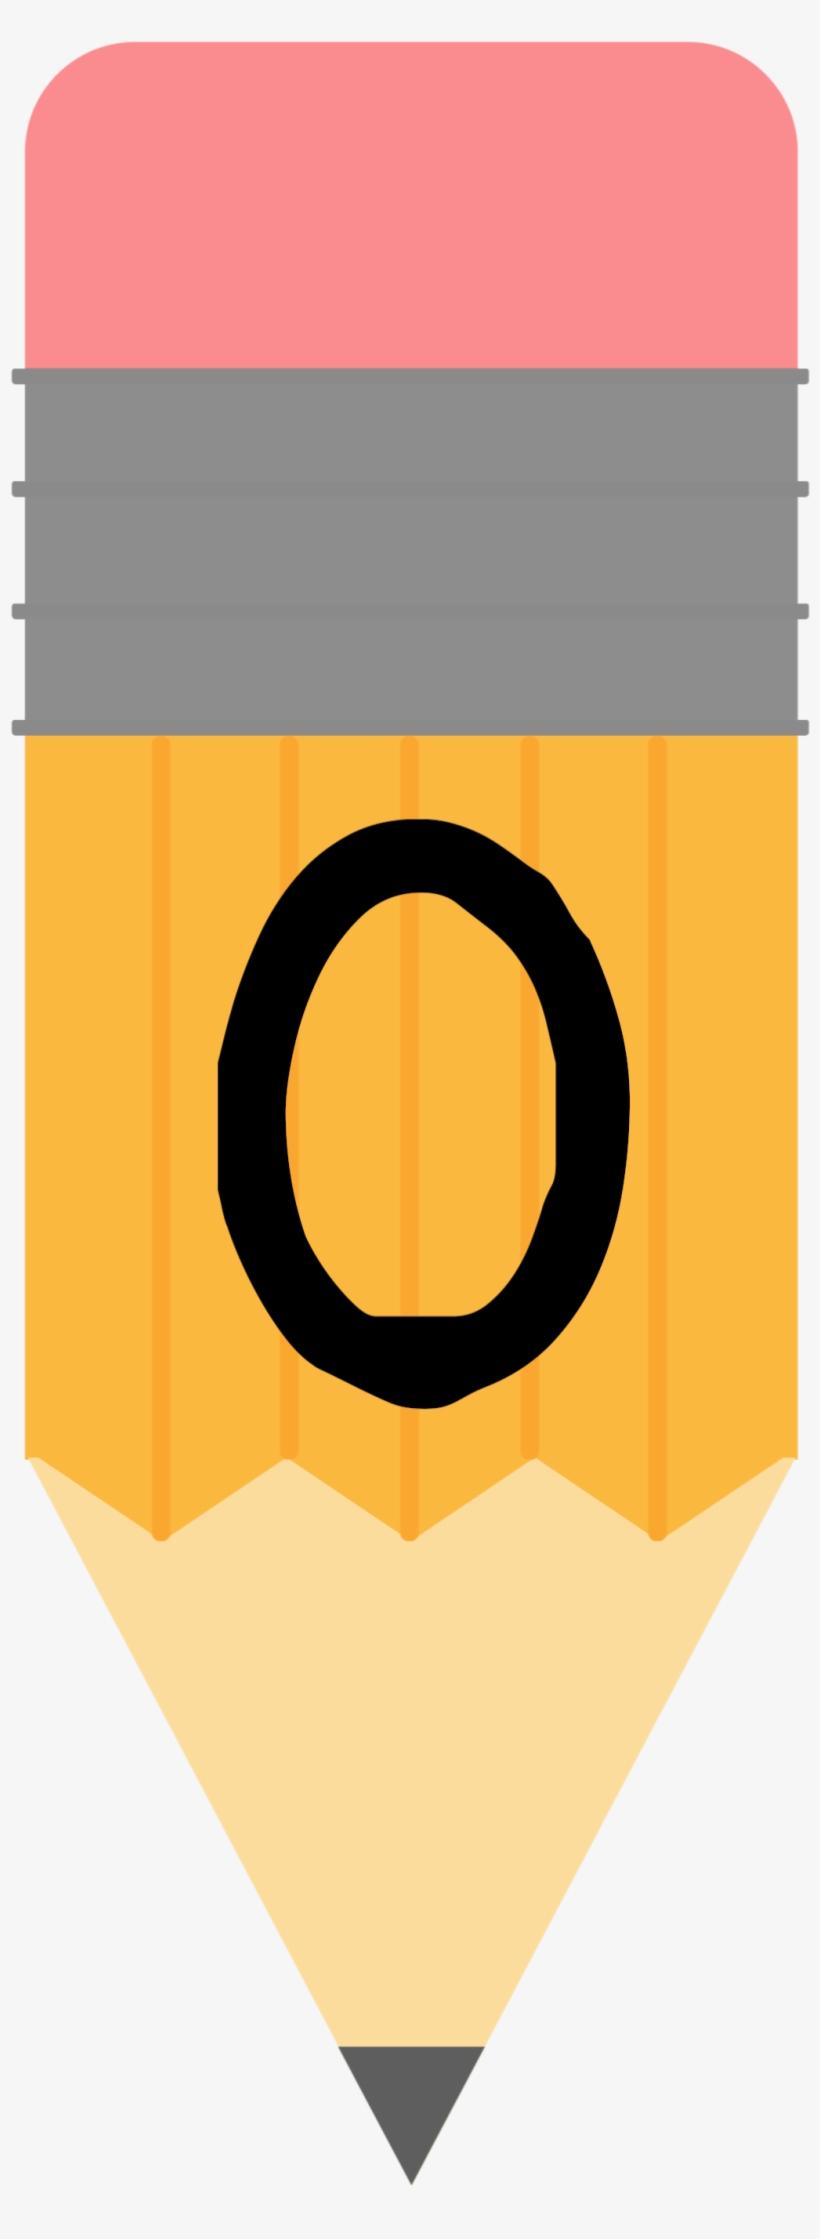 Pencil Alphabet Banner O 1,076×2,778 Pixeles - Pencil Banner Printable Banner School, transparent png #771097